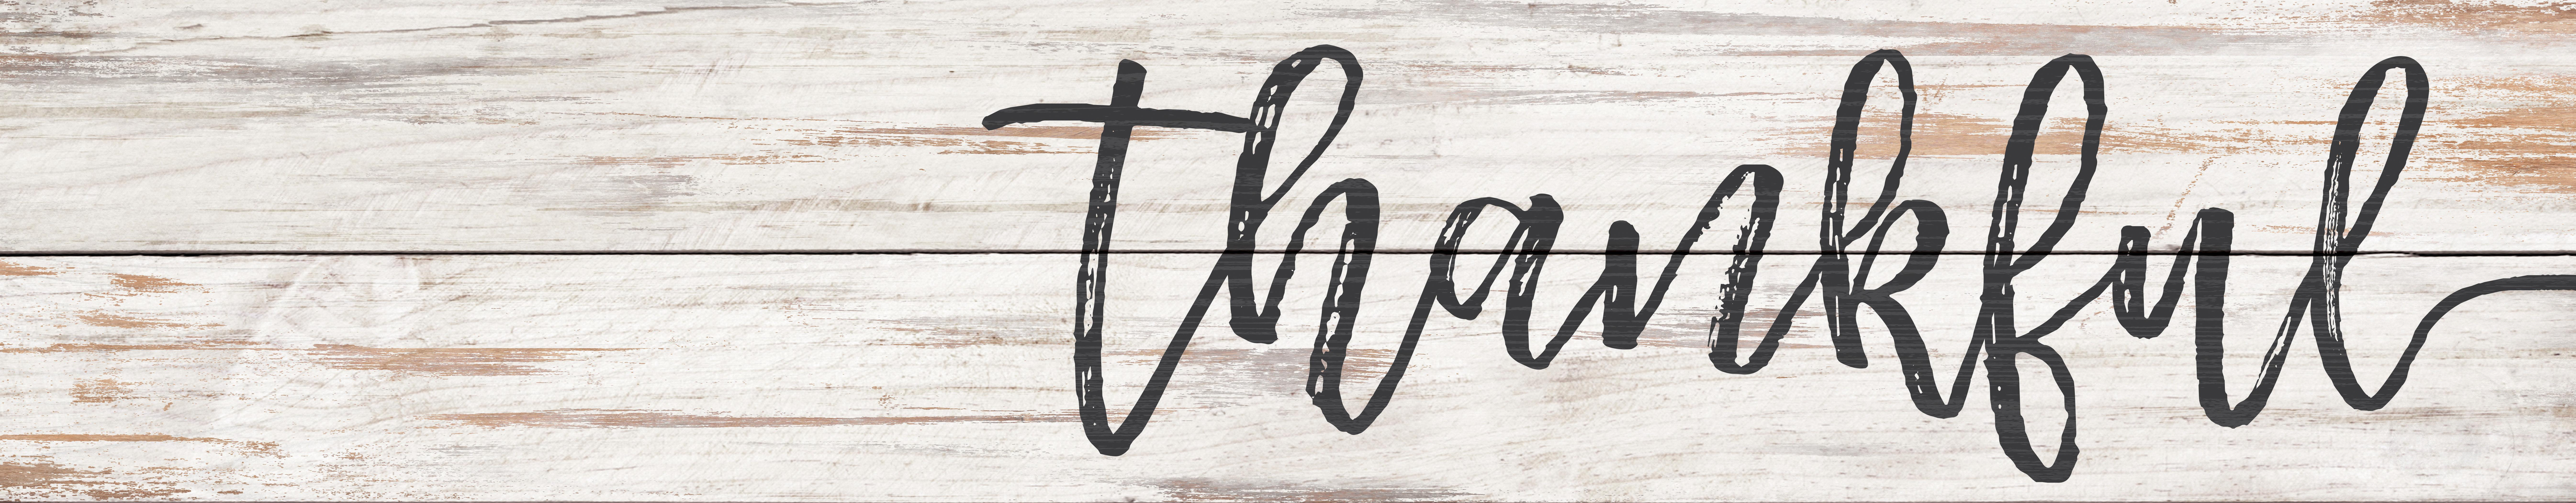 Give Thanks Wall Decor | Wayfair Throughout Fawcett Thankful Heart Wall Decor (View 10 of 30)